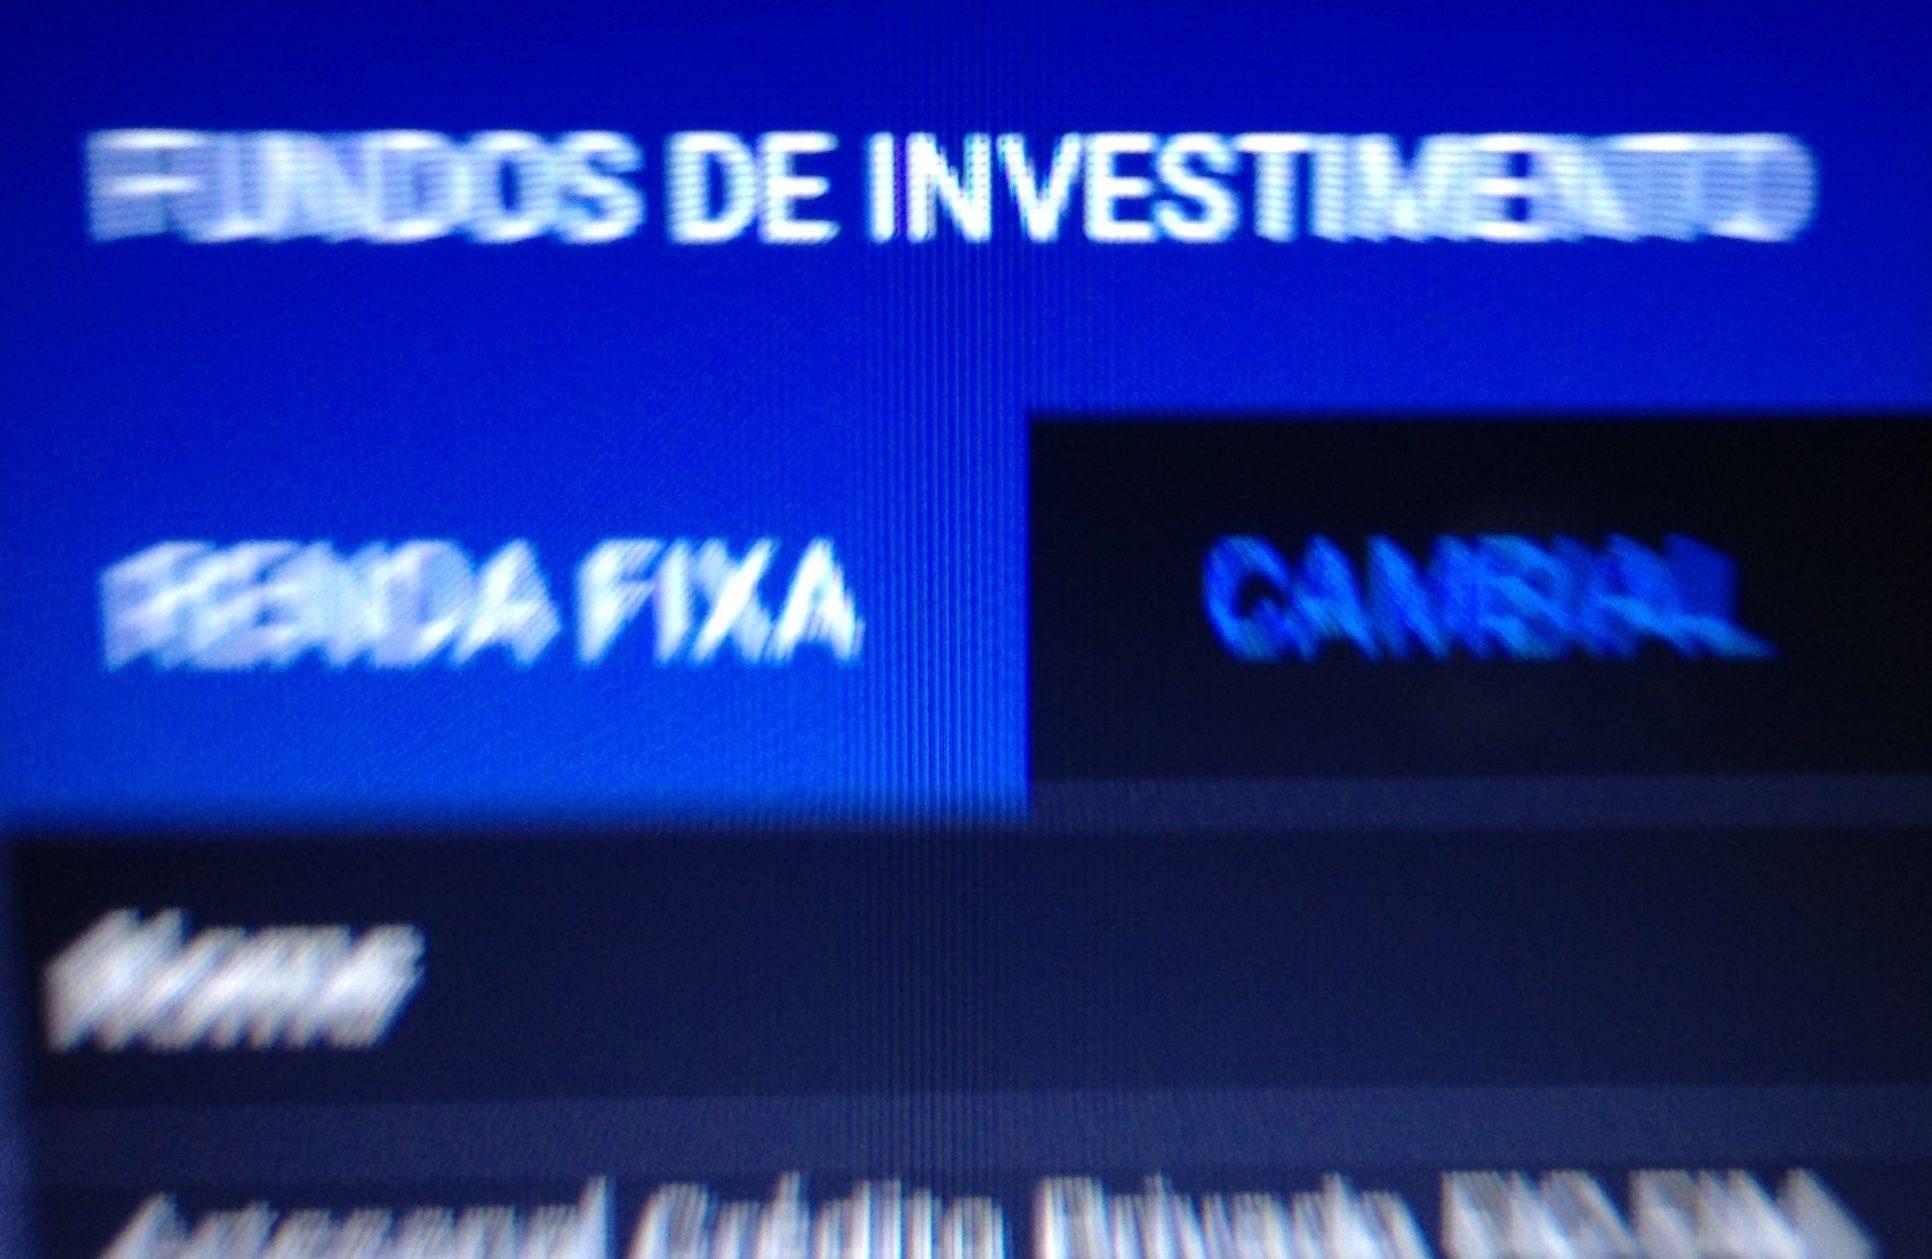 fundodeinvestimento2